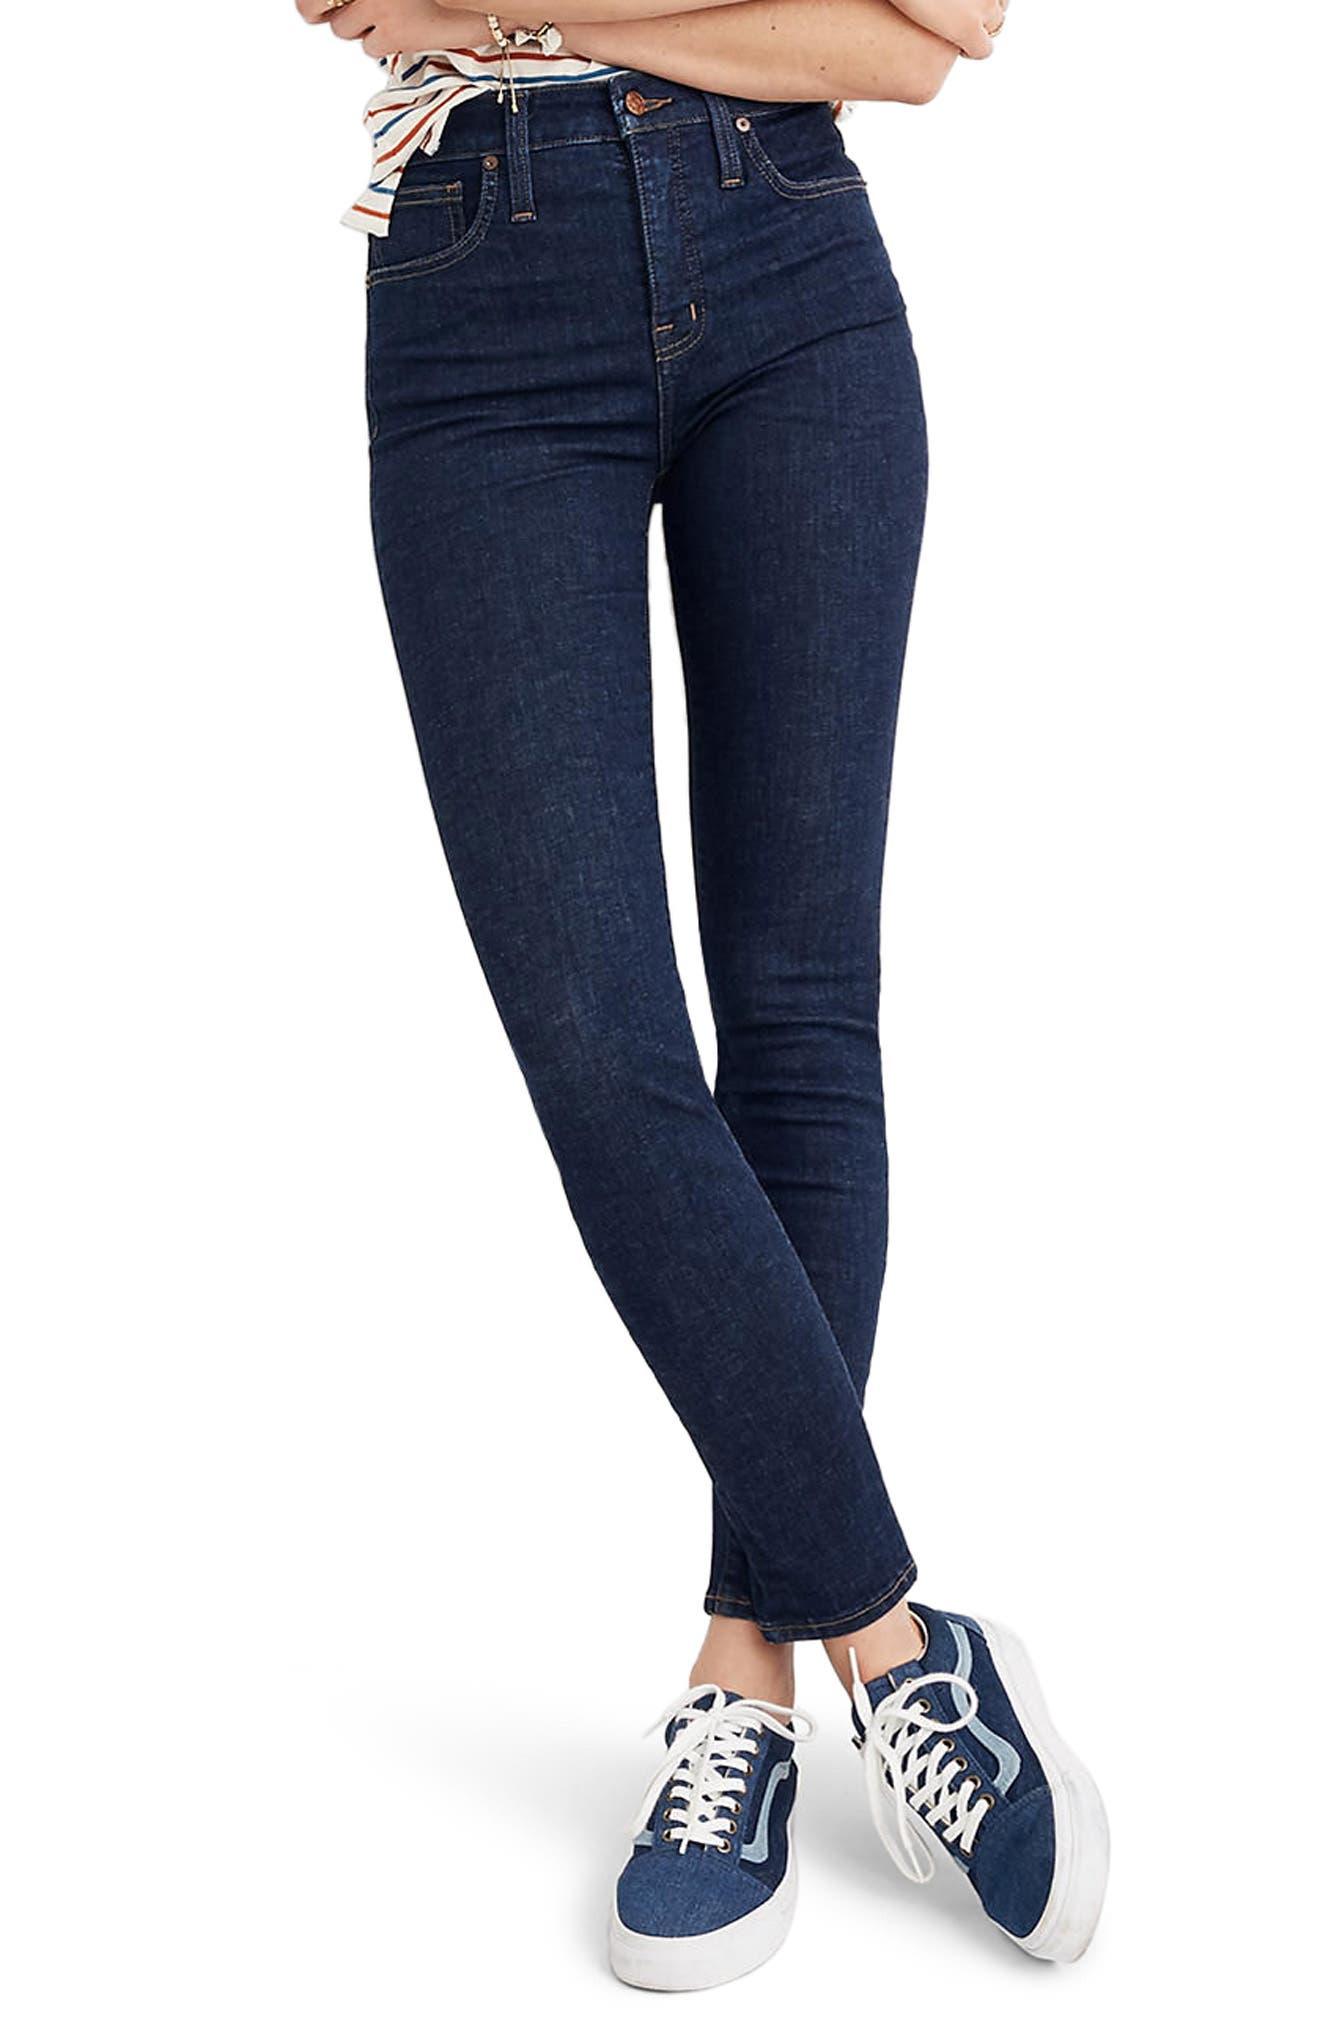 Main Image - Madewell Curvy High Waist Skinny Jeans (Lucille)